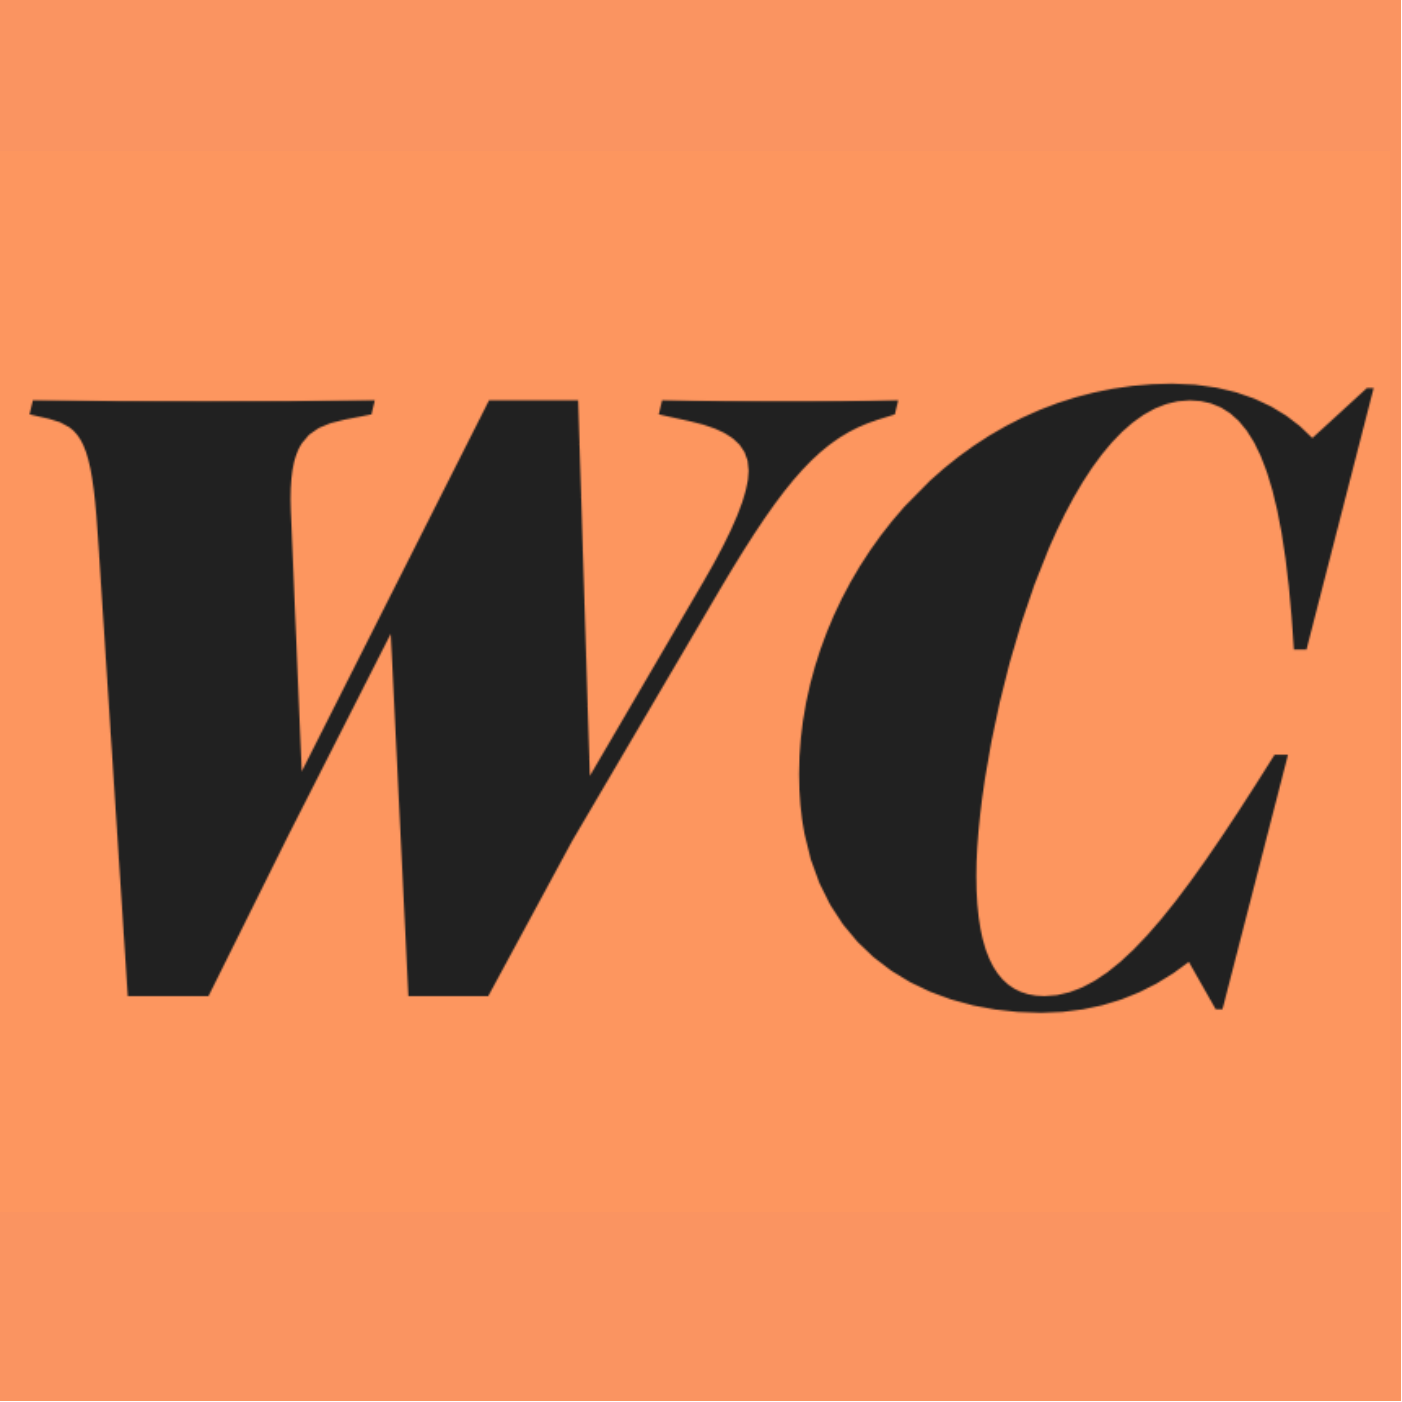 Wilson Cleveland Site logo